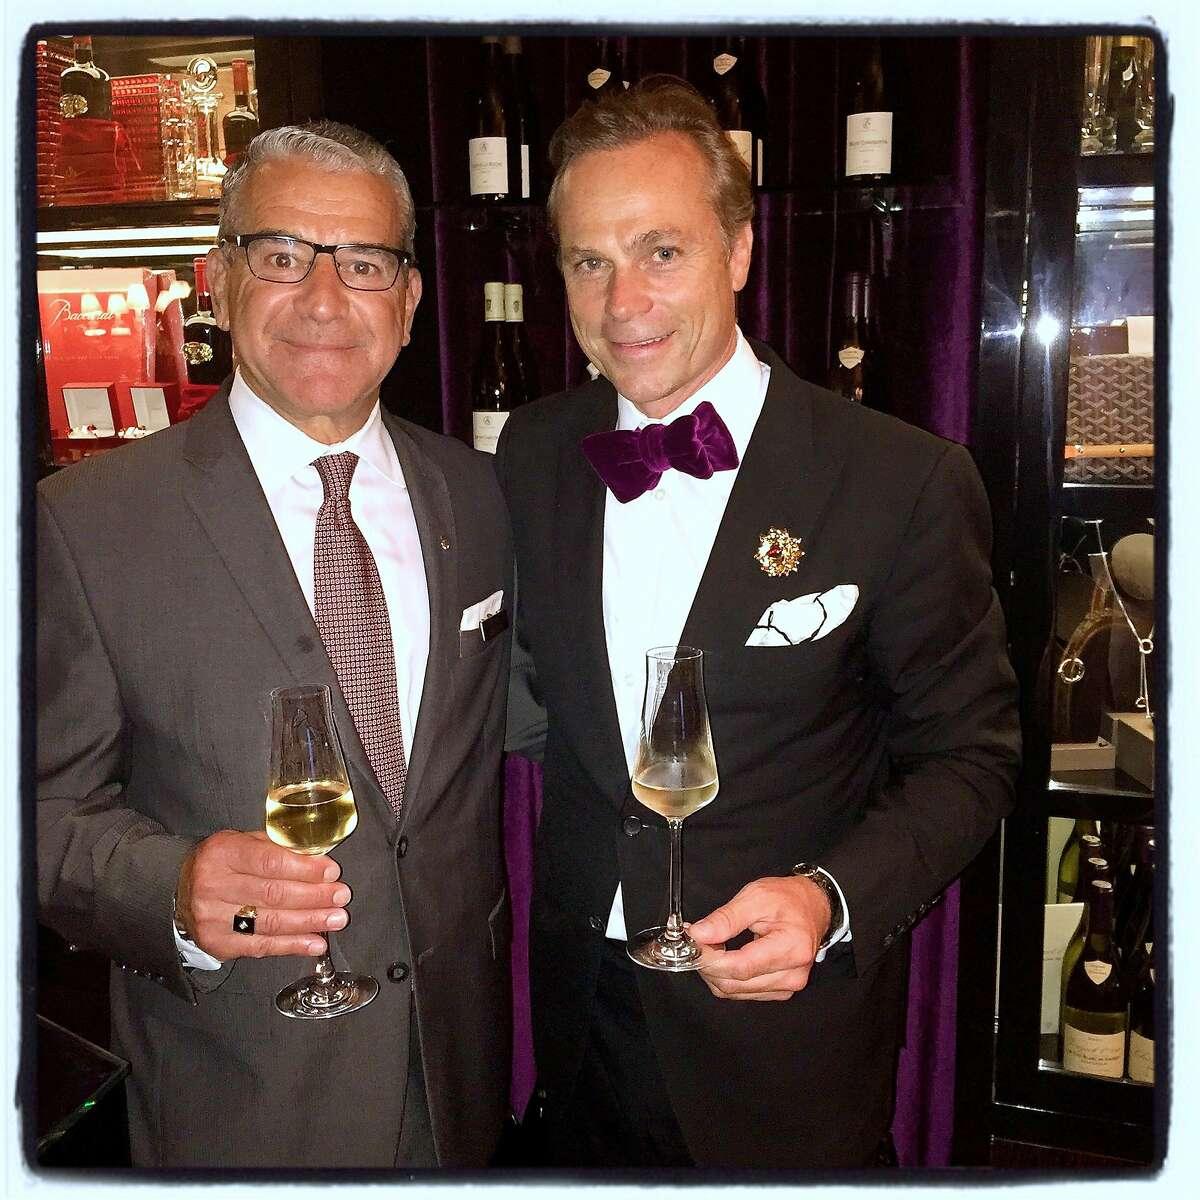 Ritz-Carlton GM Bruce Gorelick (left) celebrates the hotel's new wine lounge with designing vintner Jean-Charles Boisset. July 2015.